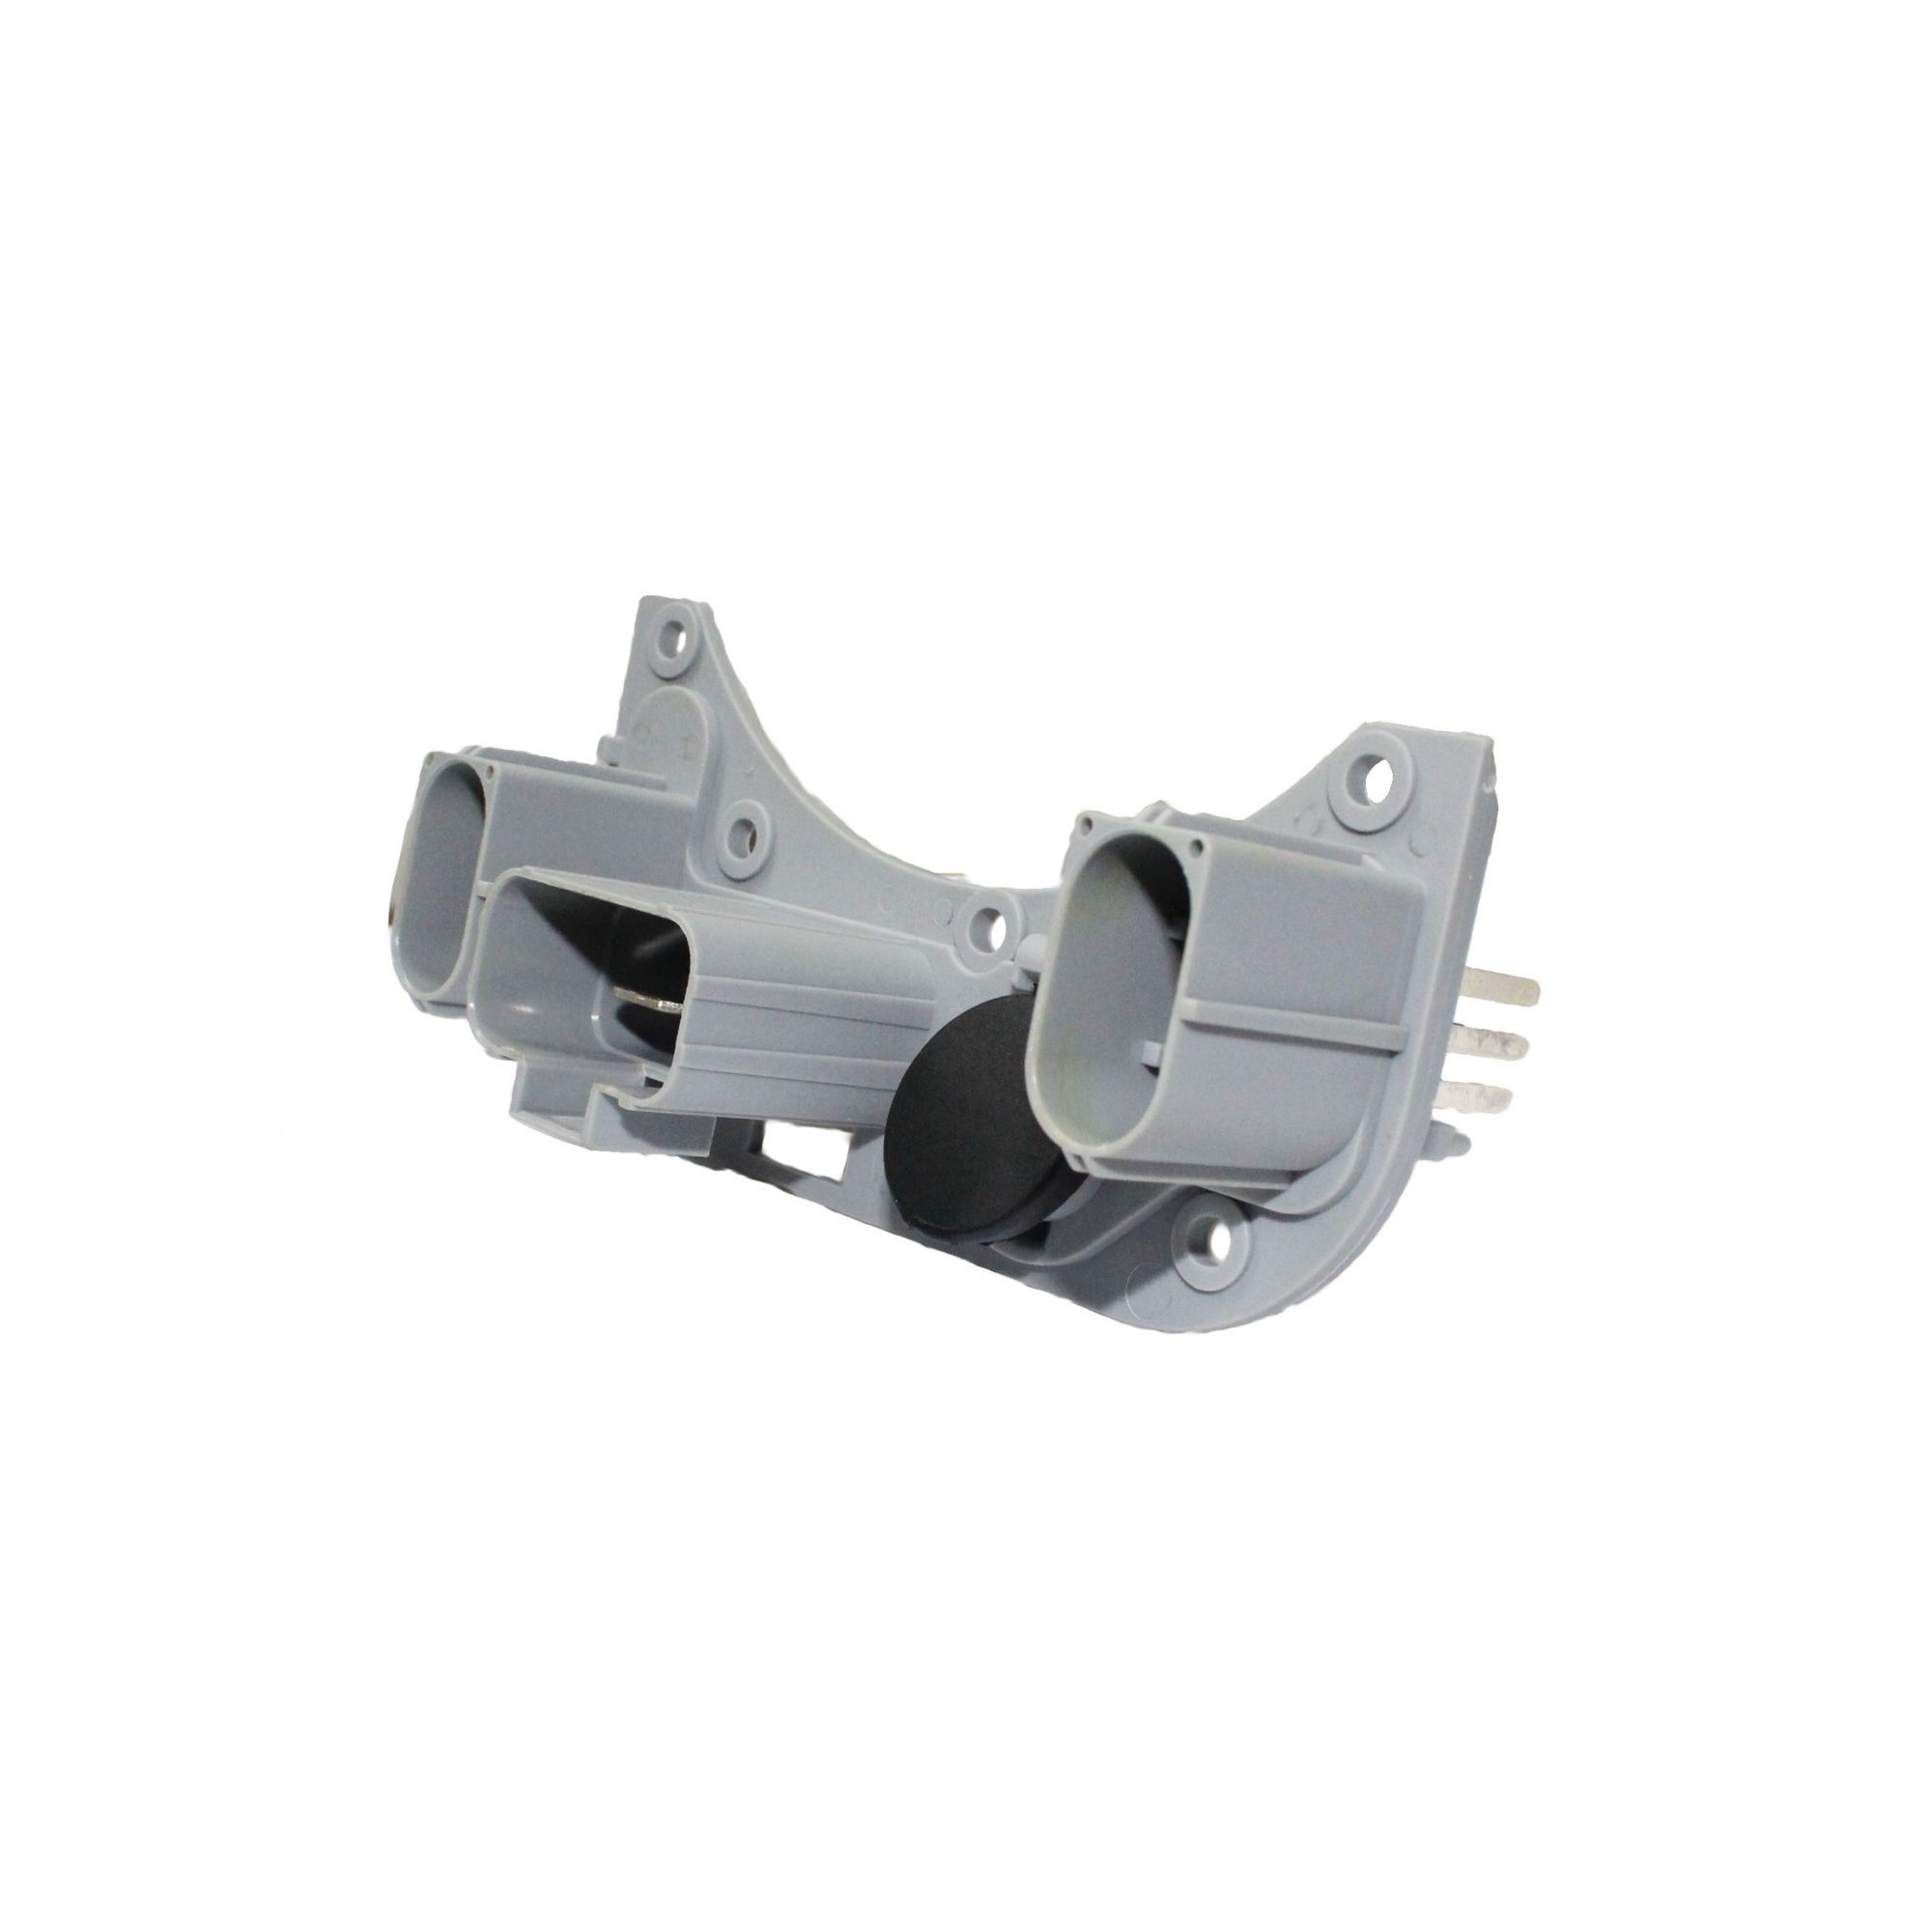 Plug Bomba Eletro-Hidráulica Ford Focus 2.0 c/ Sensor